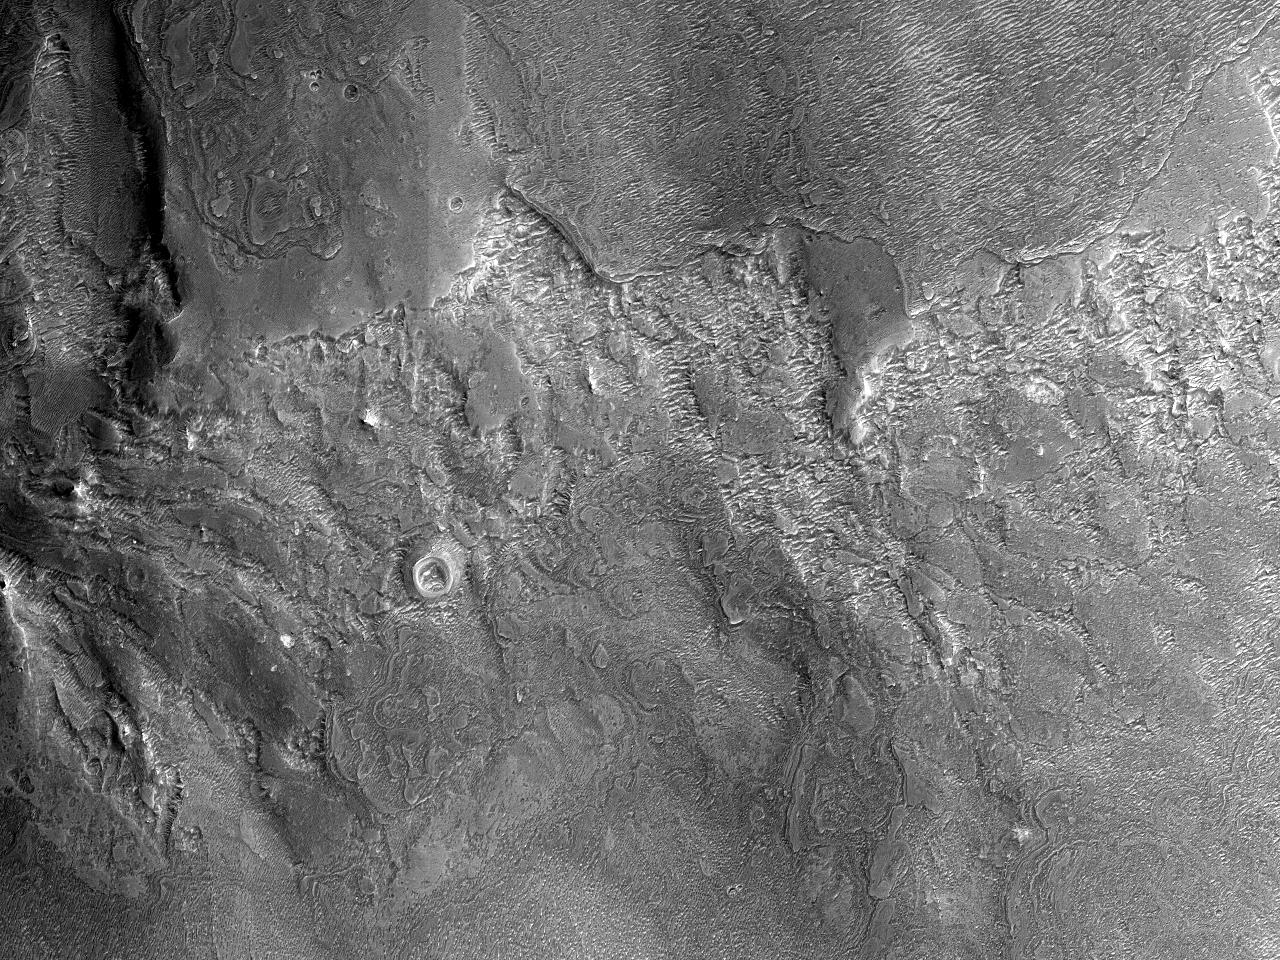 Depozite deschise la culoare in Noctis Labyrinthus